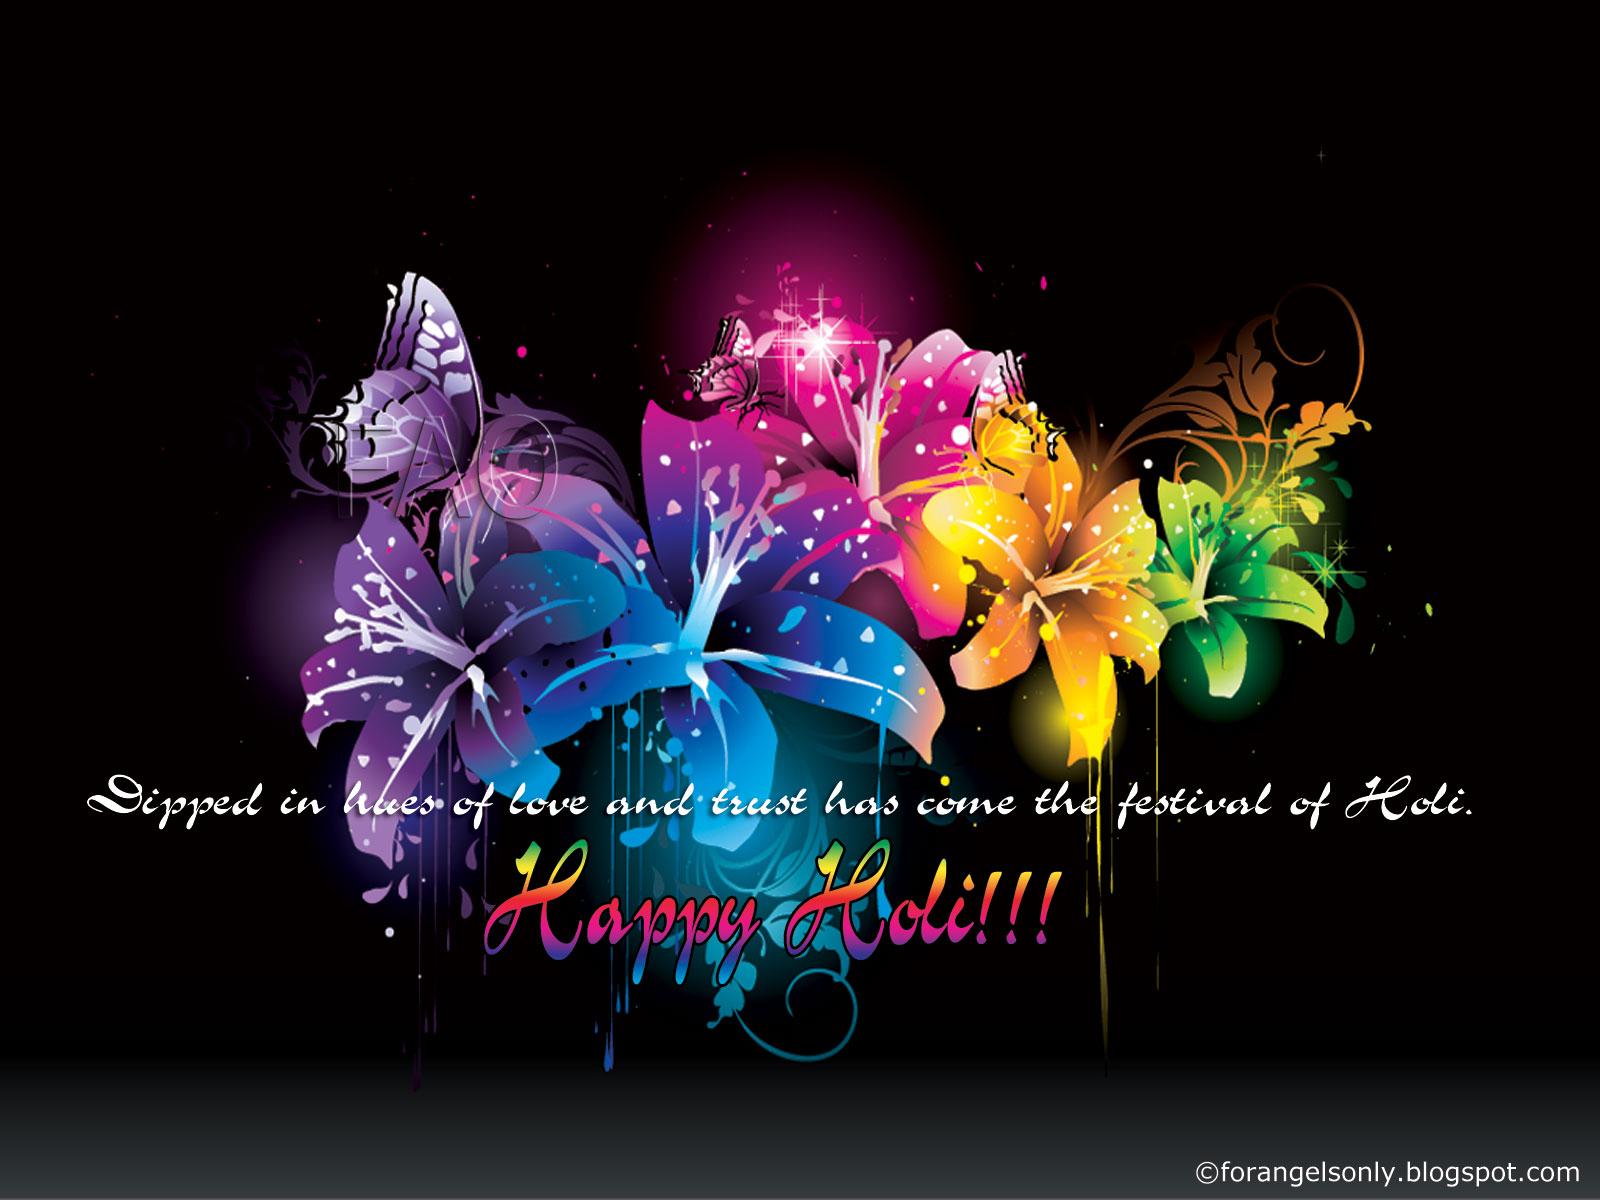 Happy Holi Widescreen HD Wallpaper 1600x1200   Holi Festival 1600x1200